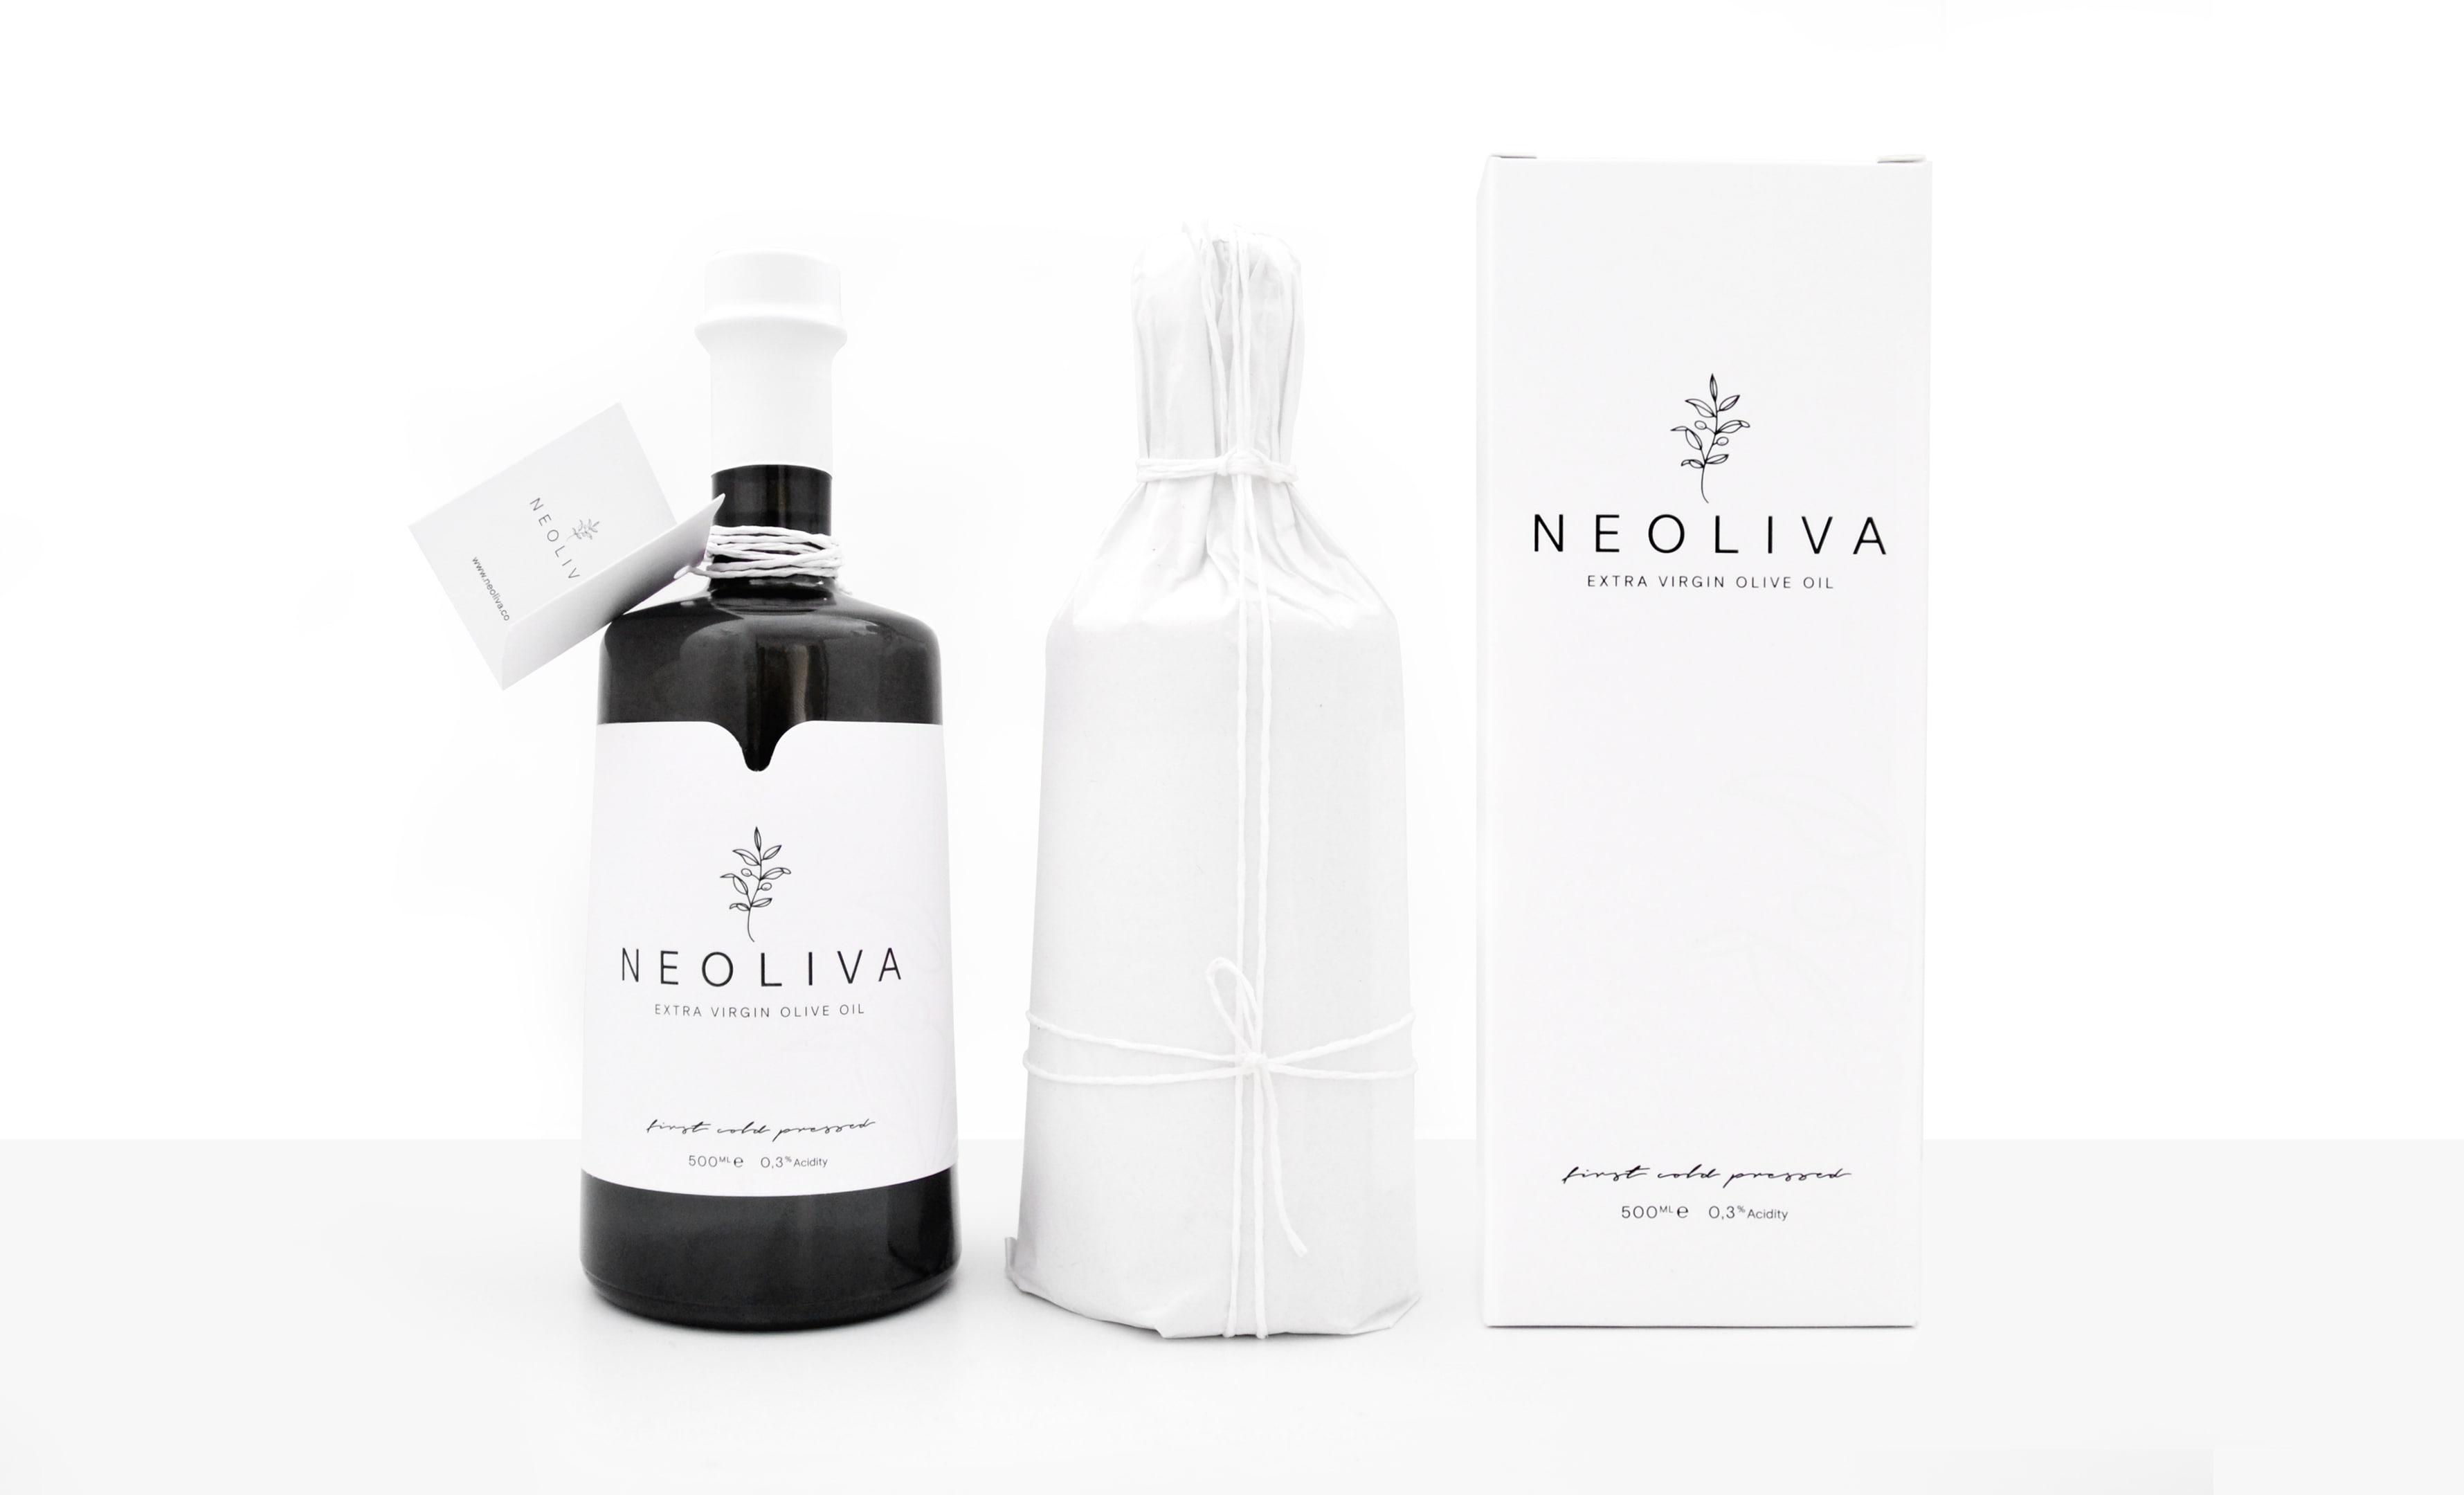 Neoliva-Gokten-Tut-Website-5-1